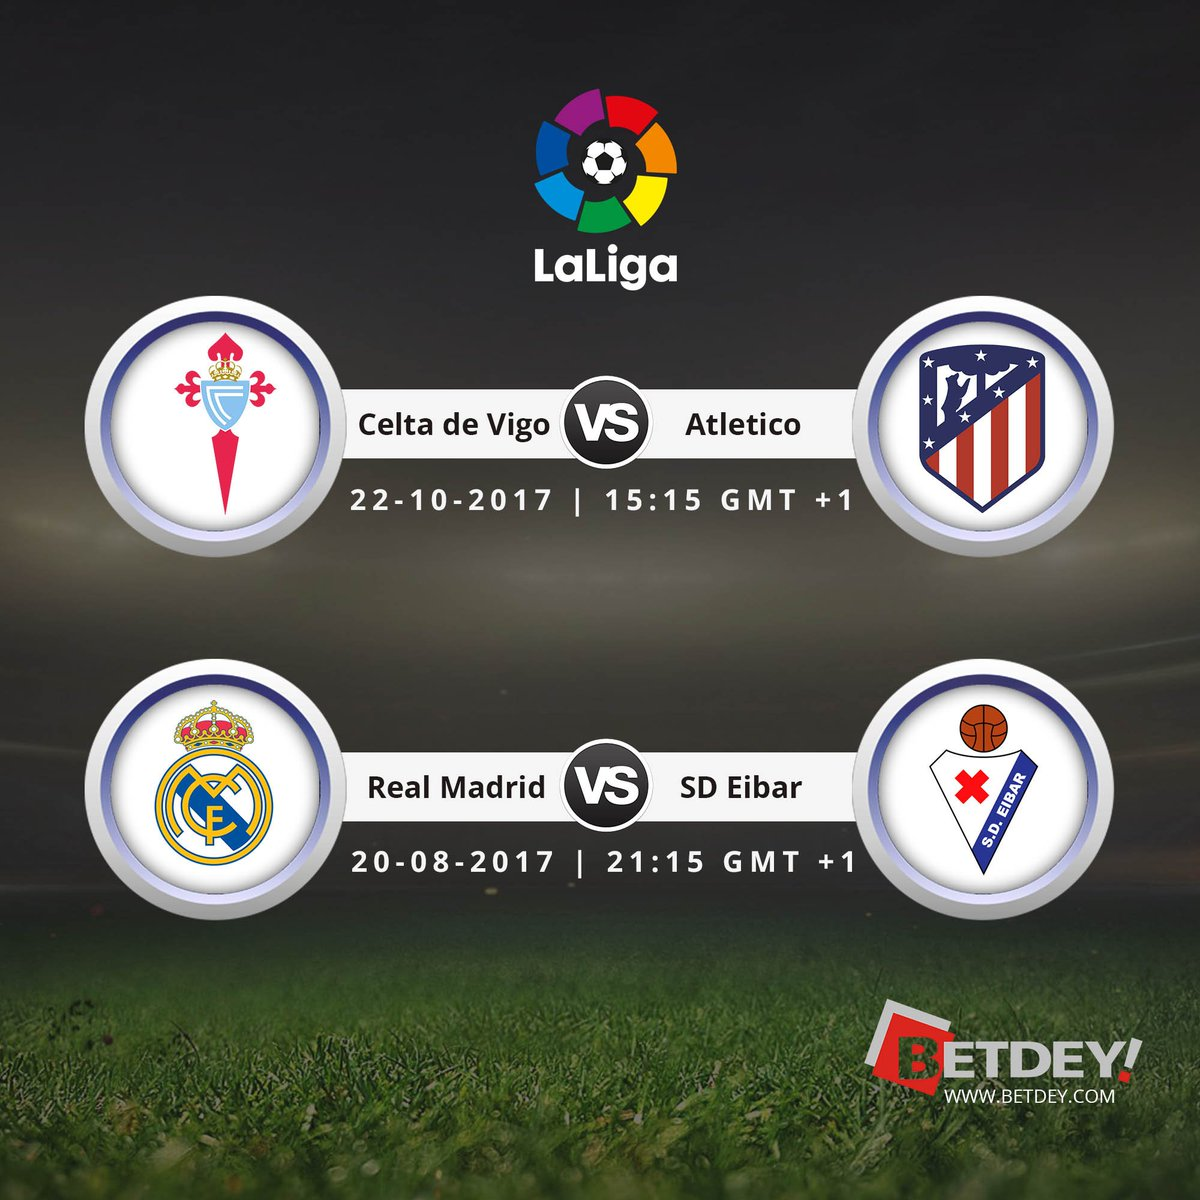 Bet here   https:// goo.gl/HsYNLE  &nbsp;    #LaLiga  15:15 GMT+1 | 22 Oct 2017 #Betdey #Realmadrid #Atletico <br>http://pic.twitter.com/lSiKFbJ03Q